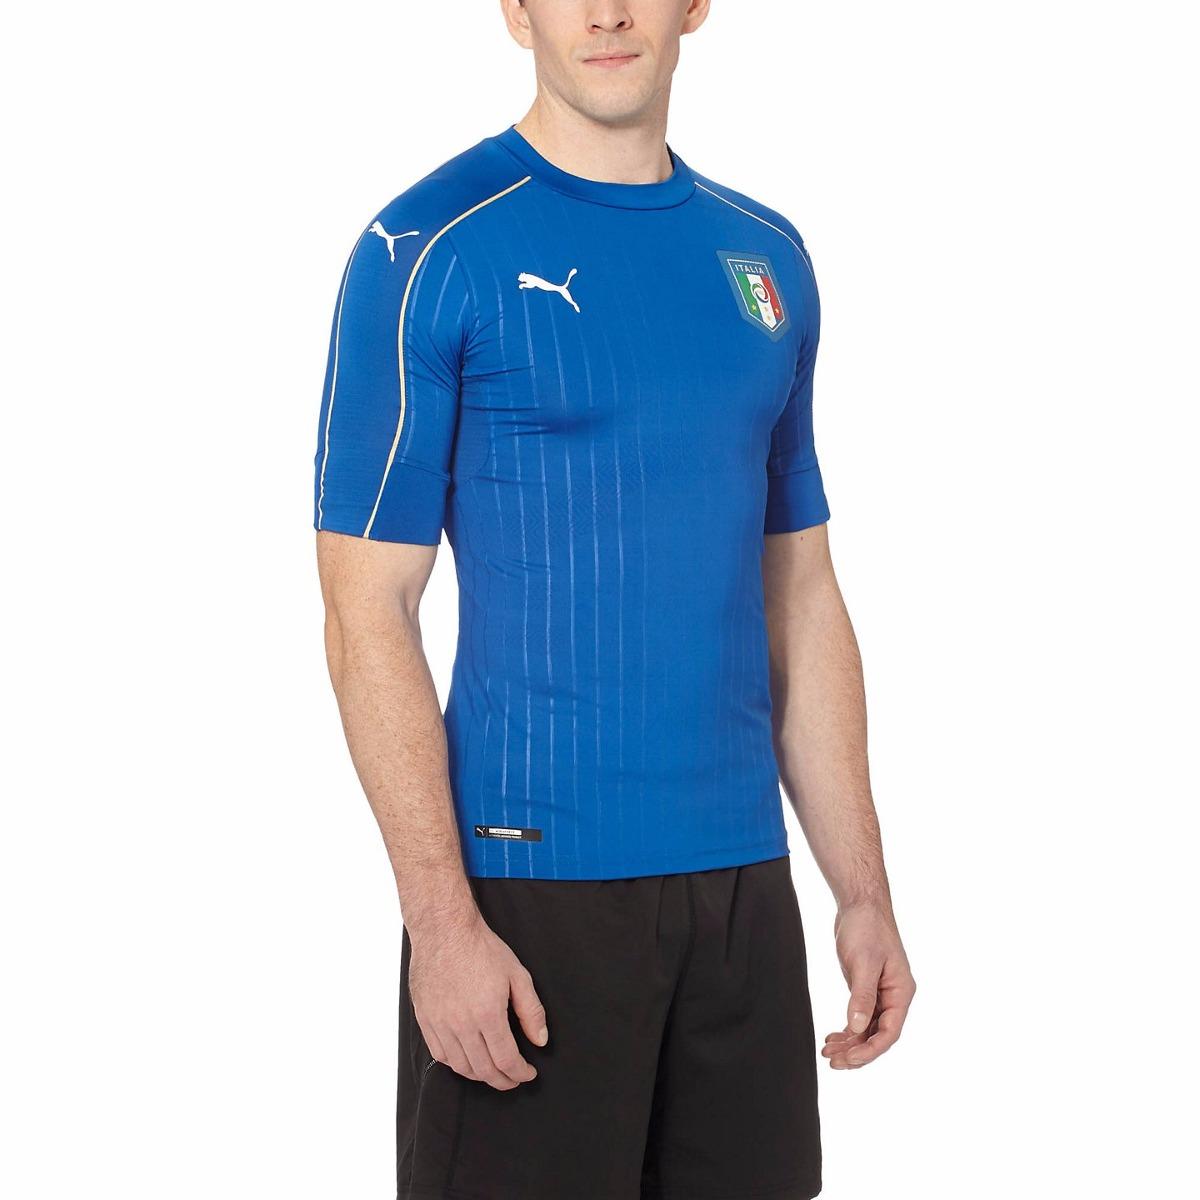 camiseta puma t. m 2016 17 figc italia home authentic jersey. Carregando  zoom. 464a37d11e614